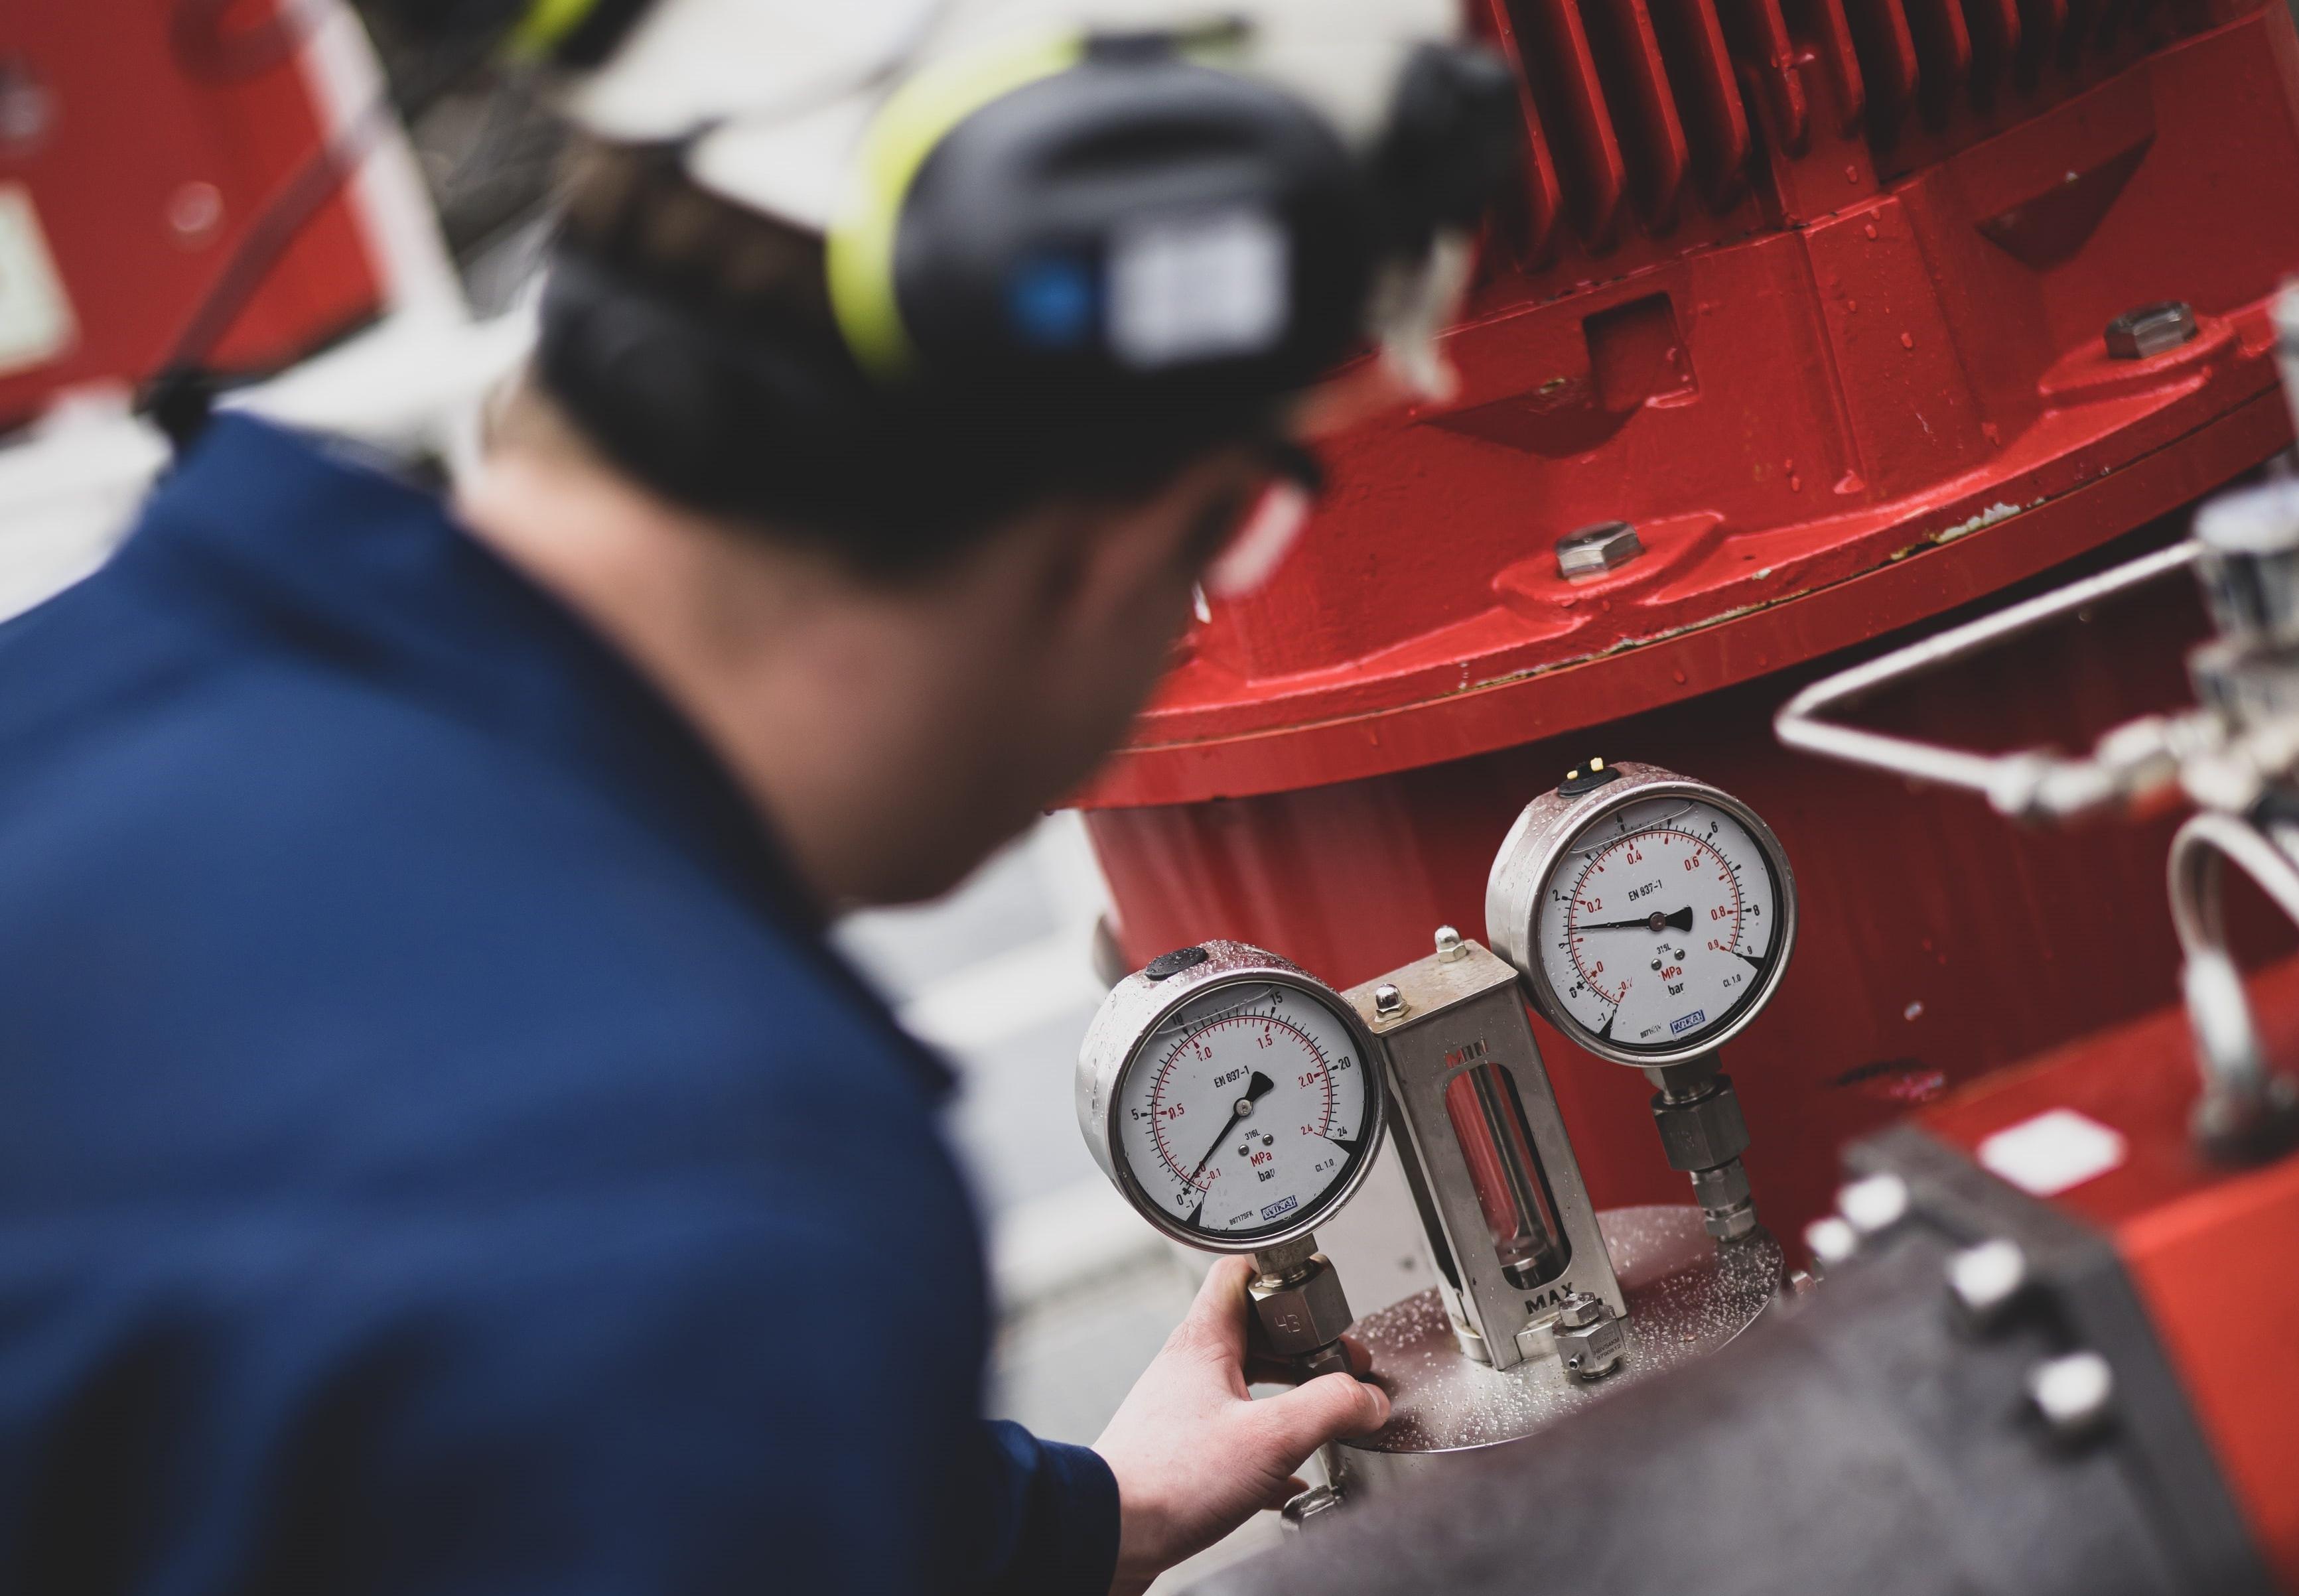 Høglund tech deployed on Norway's 1st LNG bunkering ship